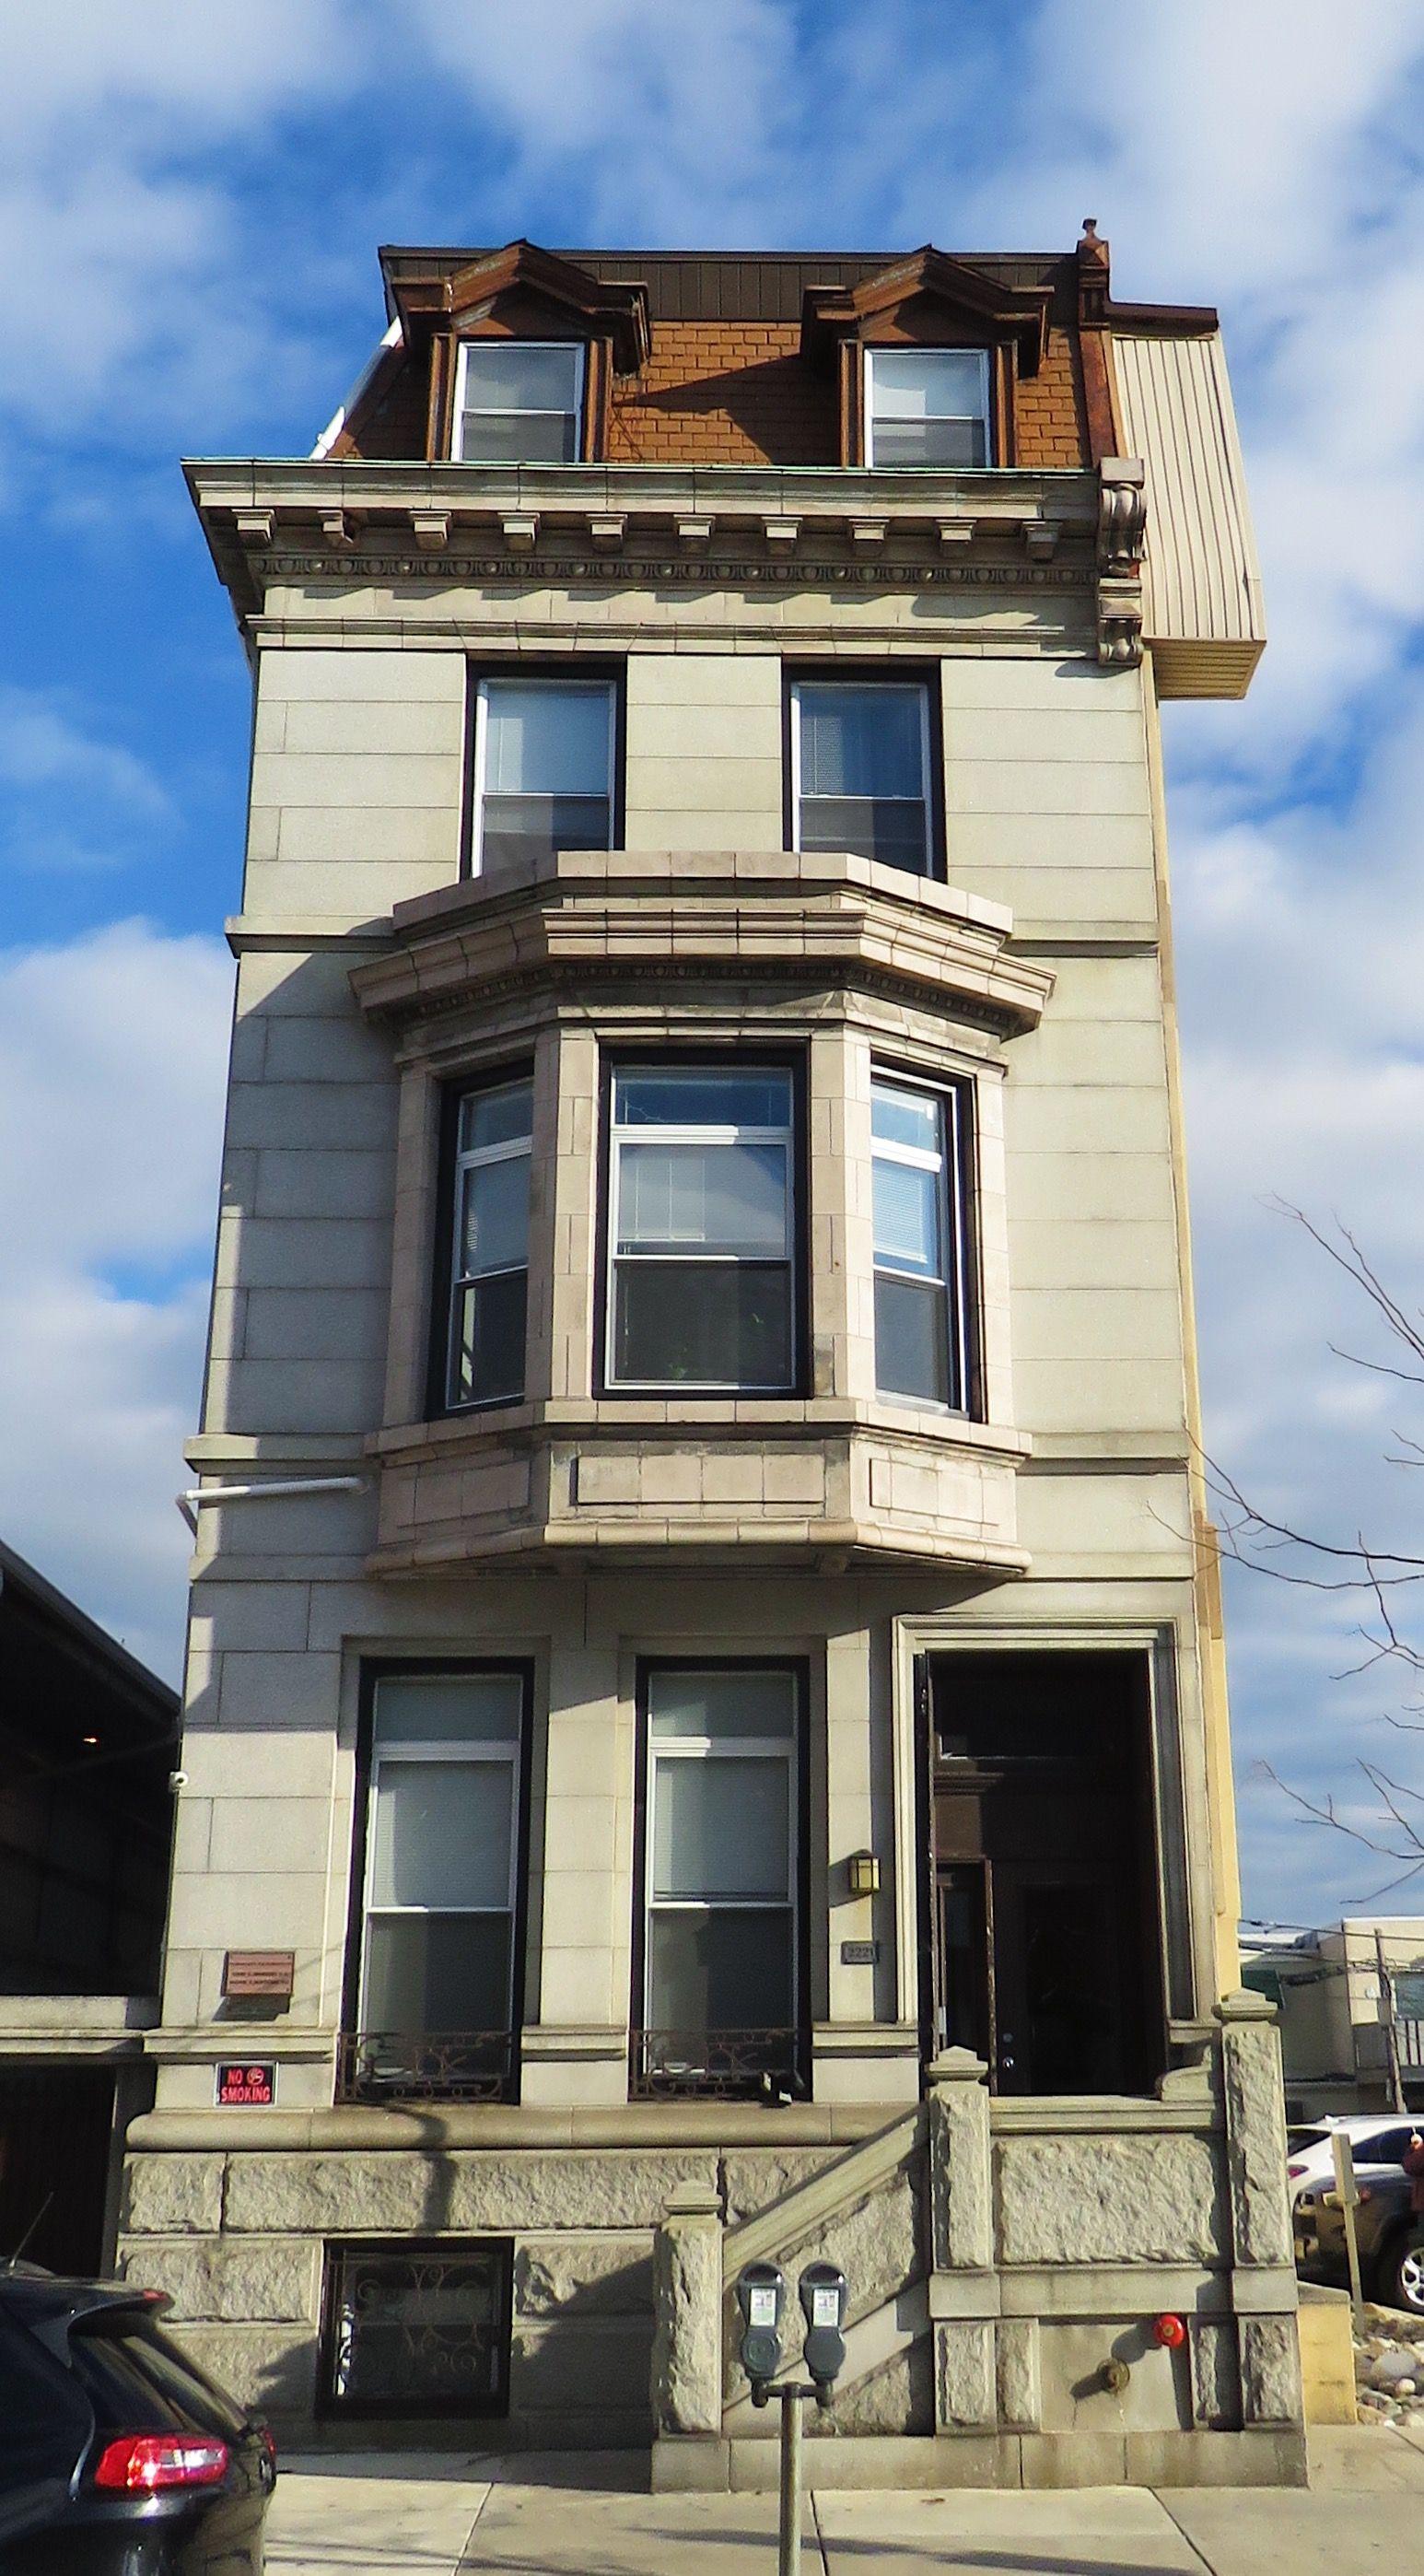 2221 S Broad St. Phila, PA 19148 1 Bedroom Apt for Rent